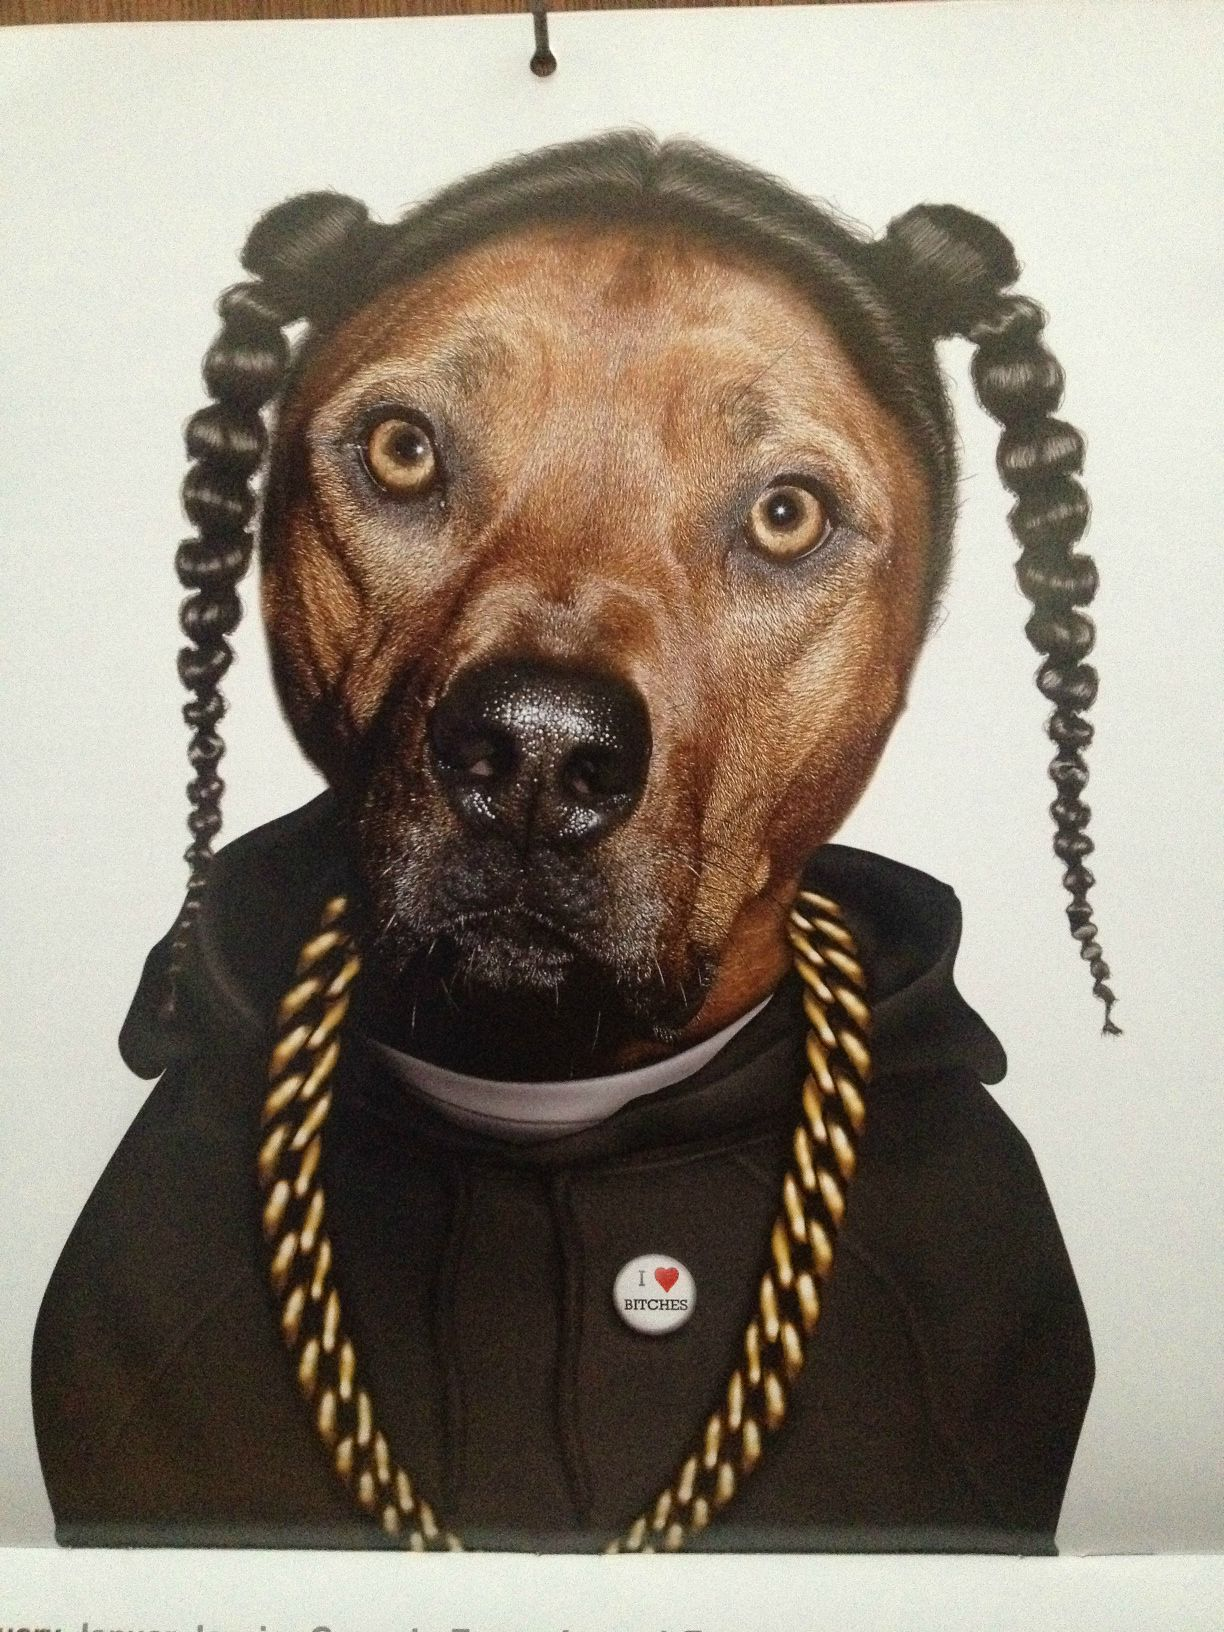 Snoop Doggy Dog Snoop Dog Funny Dogs Snoop Dogg